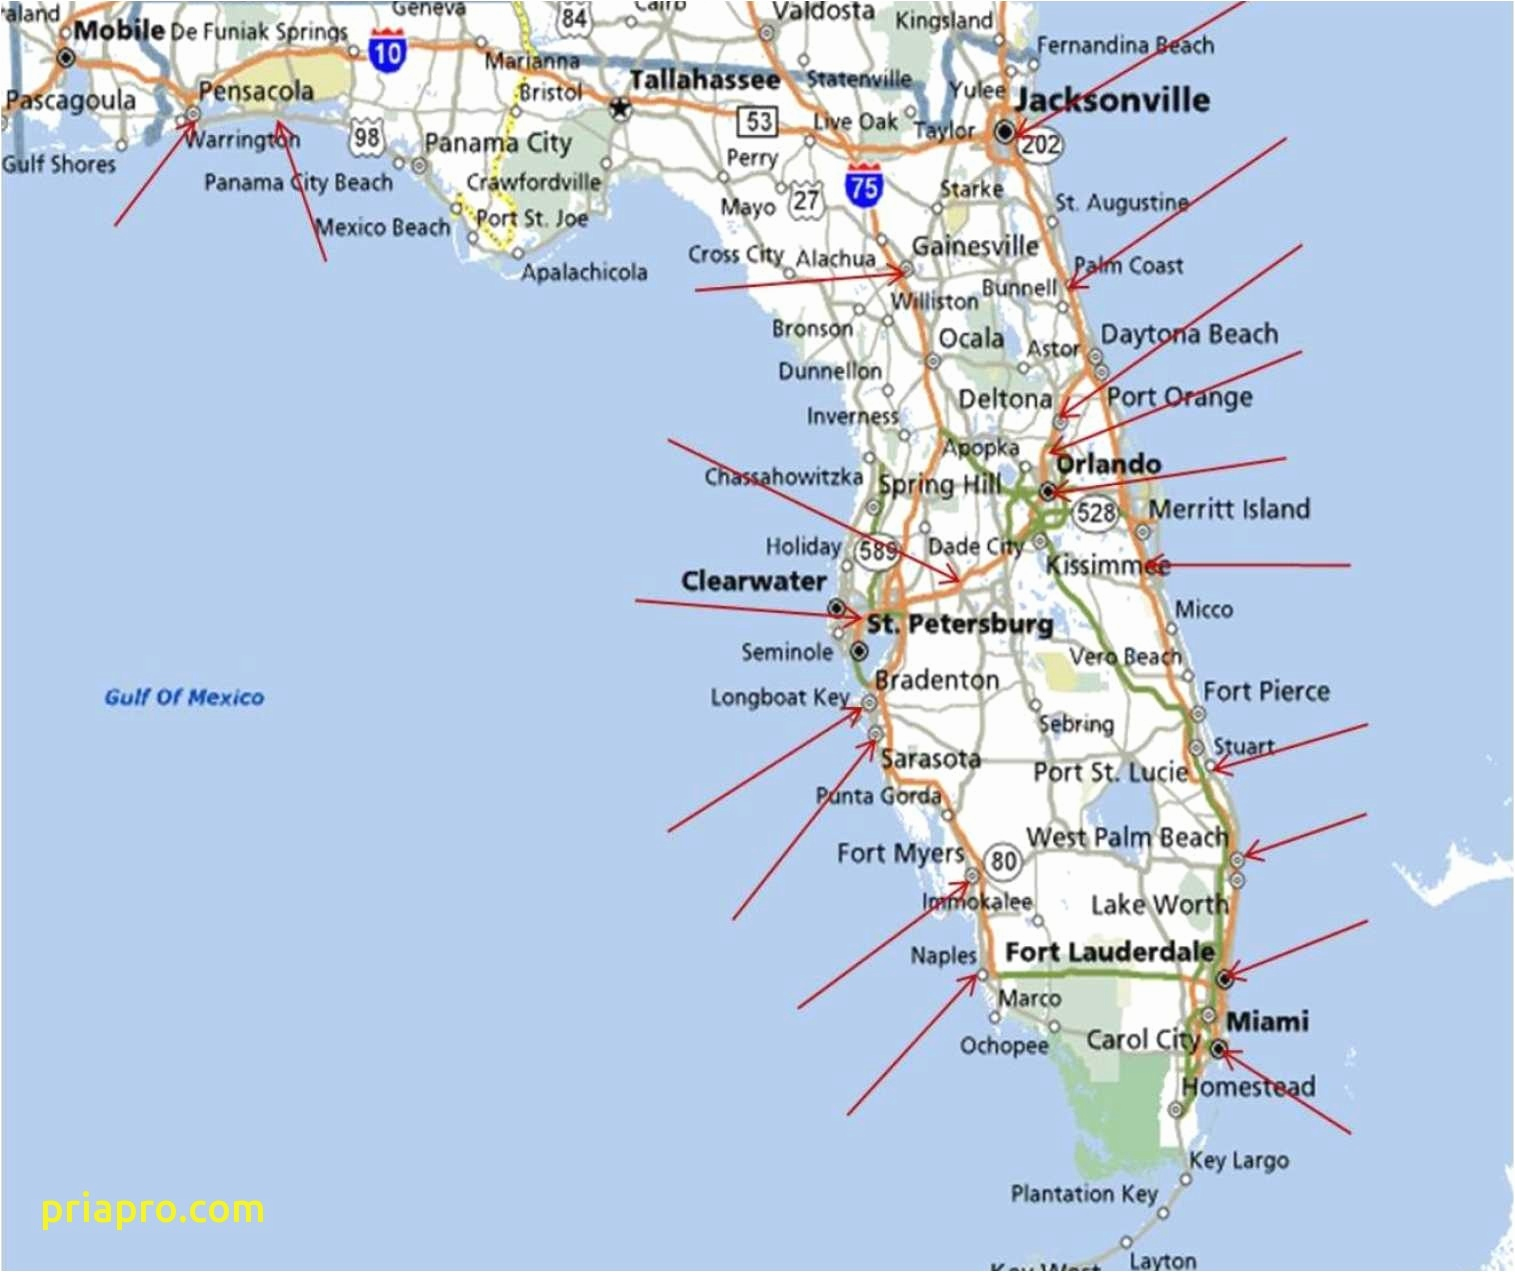 East Coast Beaches Map Inspirational Florida Beach Map Florida River - Map Of Eastern Florida Beaches